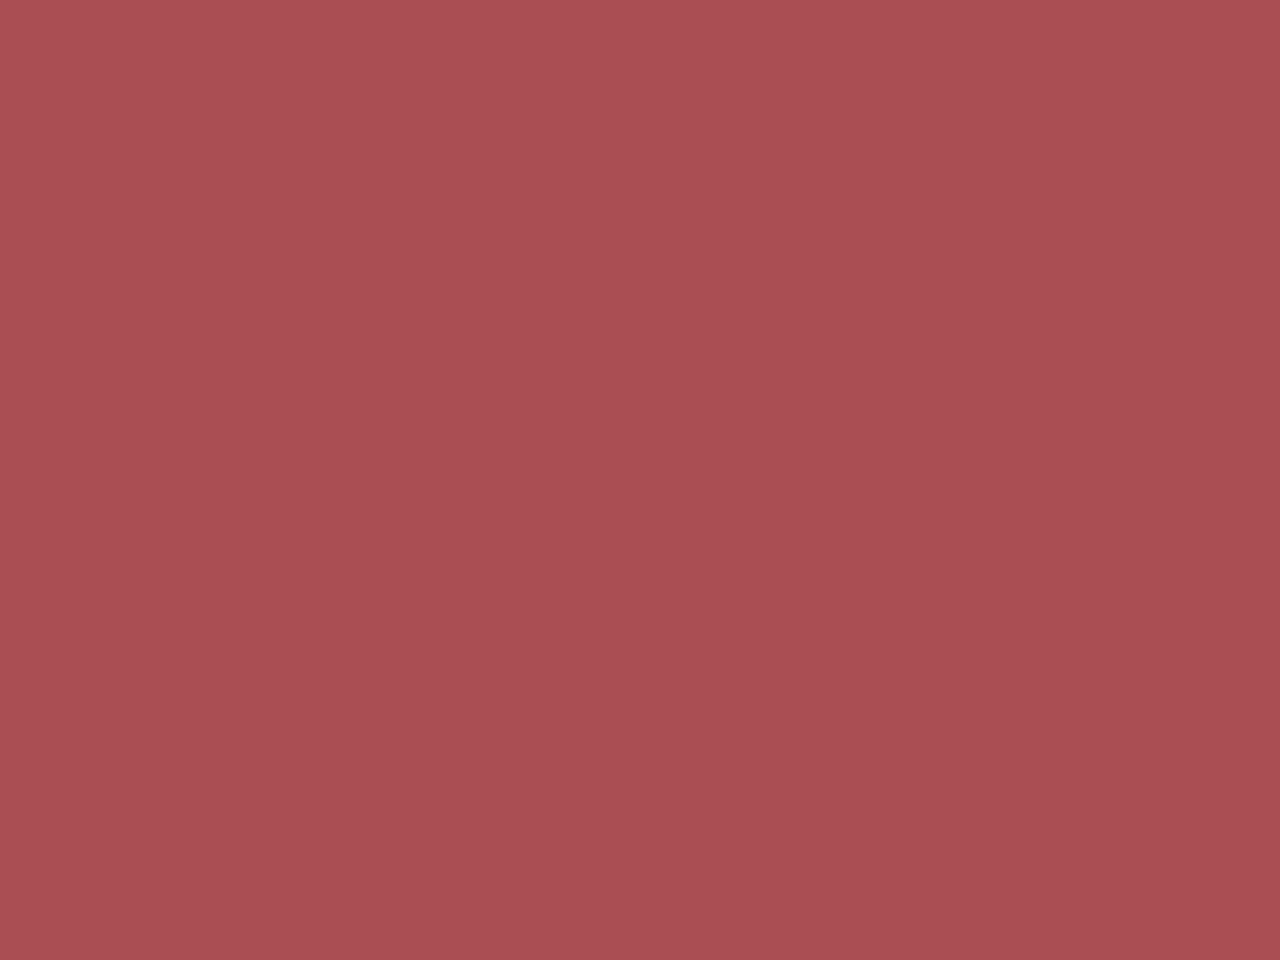 1280x960 Rose Vale Solid Color Background